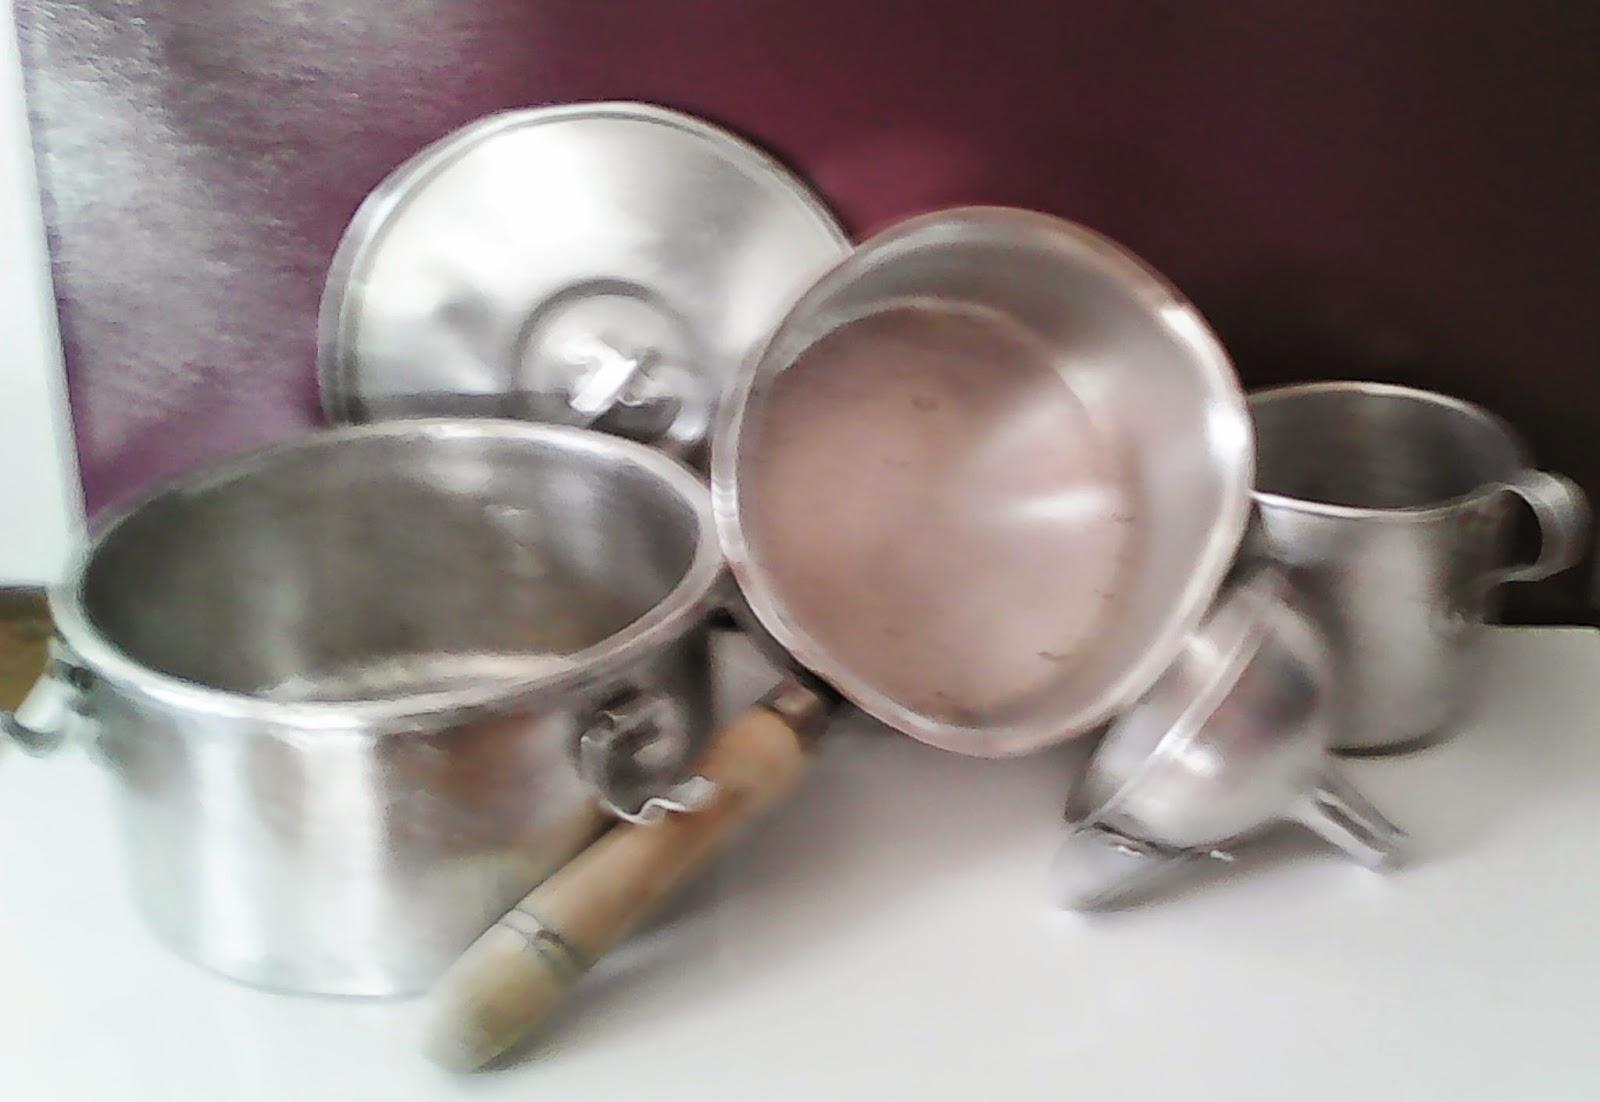 O desv n vintage do pereiro lote utensilios de cocina de for Utensilios de cocina de ceramica